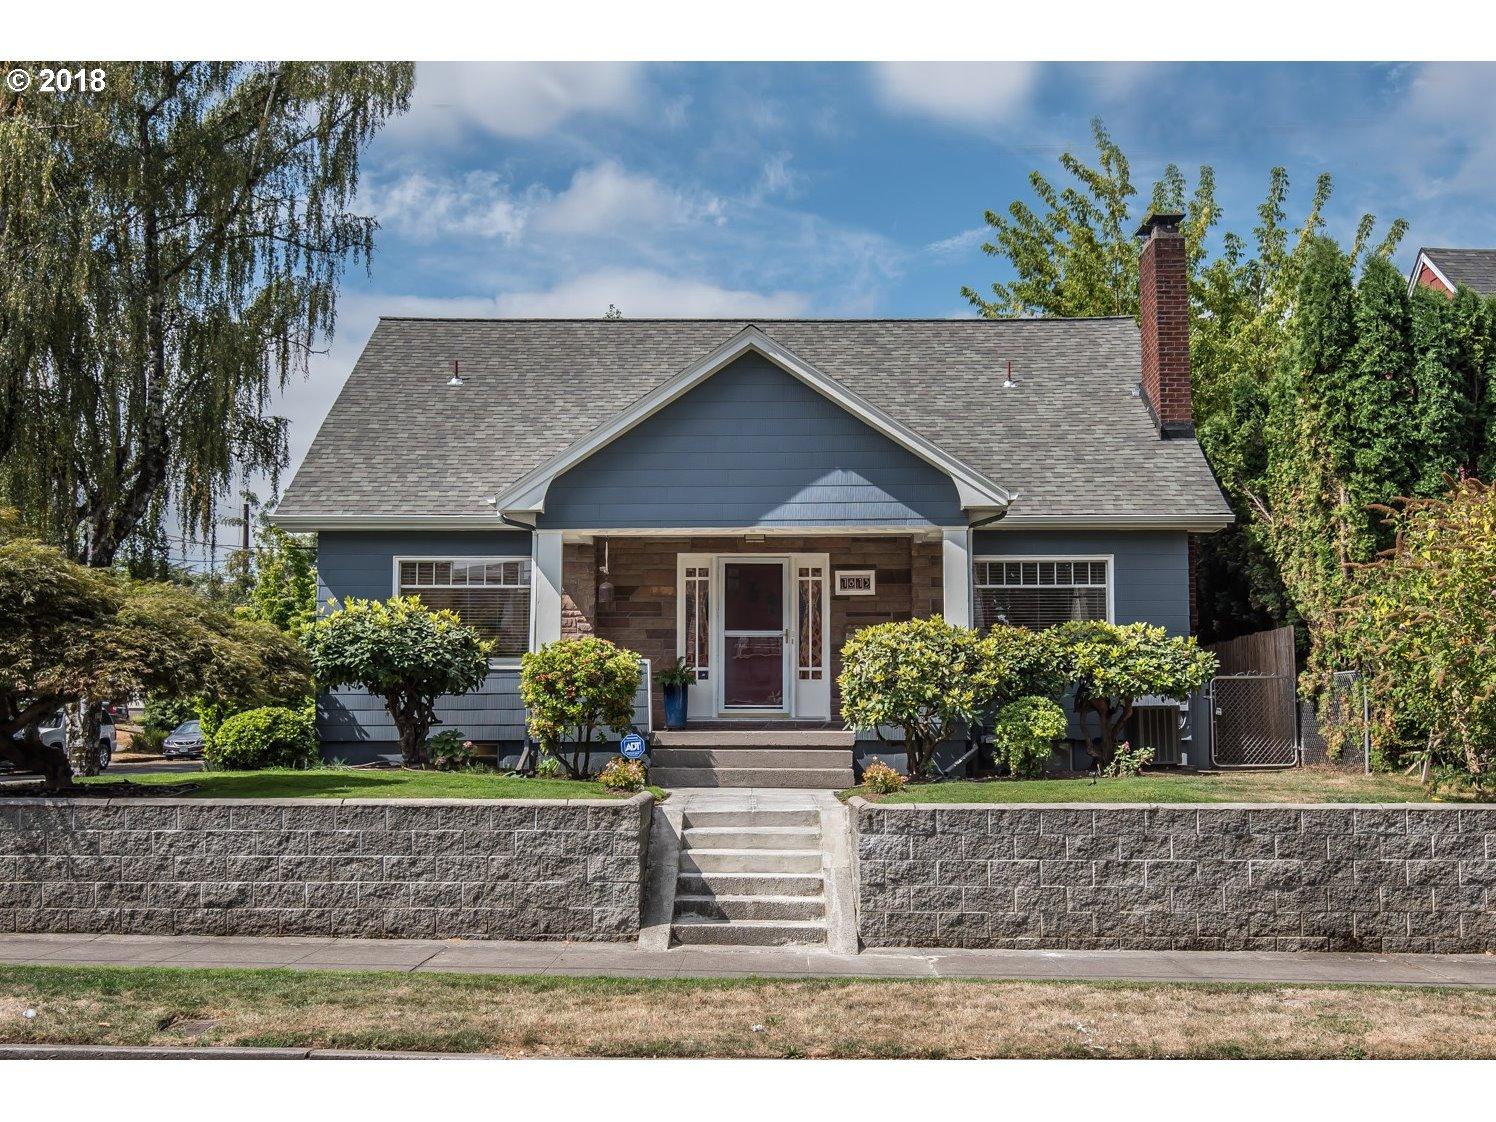 1815 SE 30TH AVE, Portland OR 97214